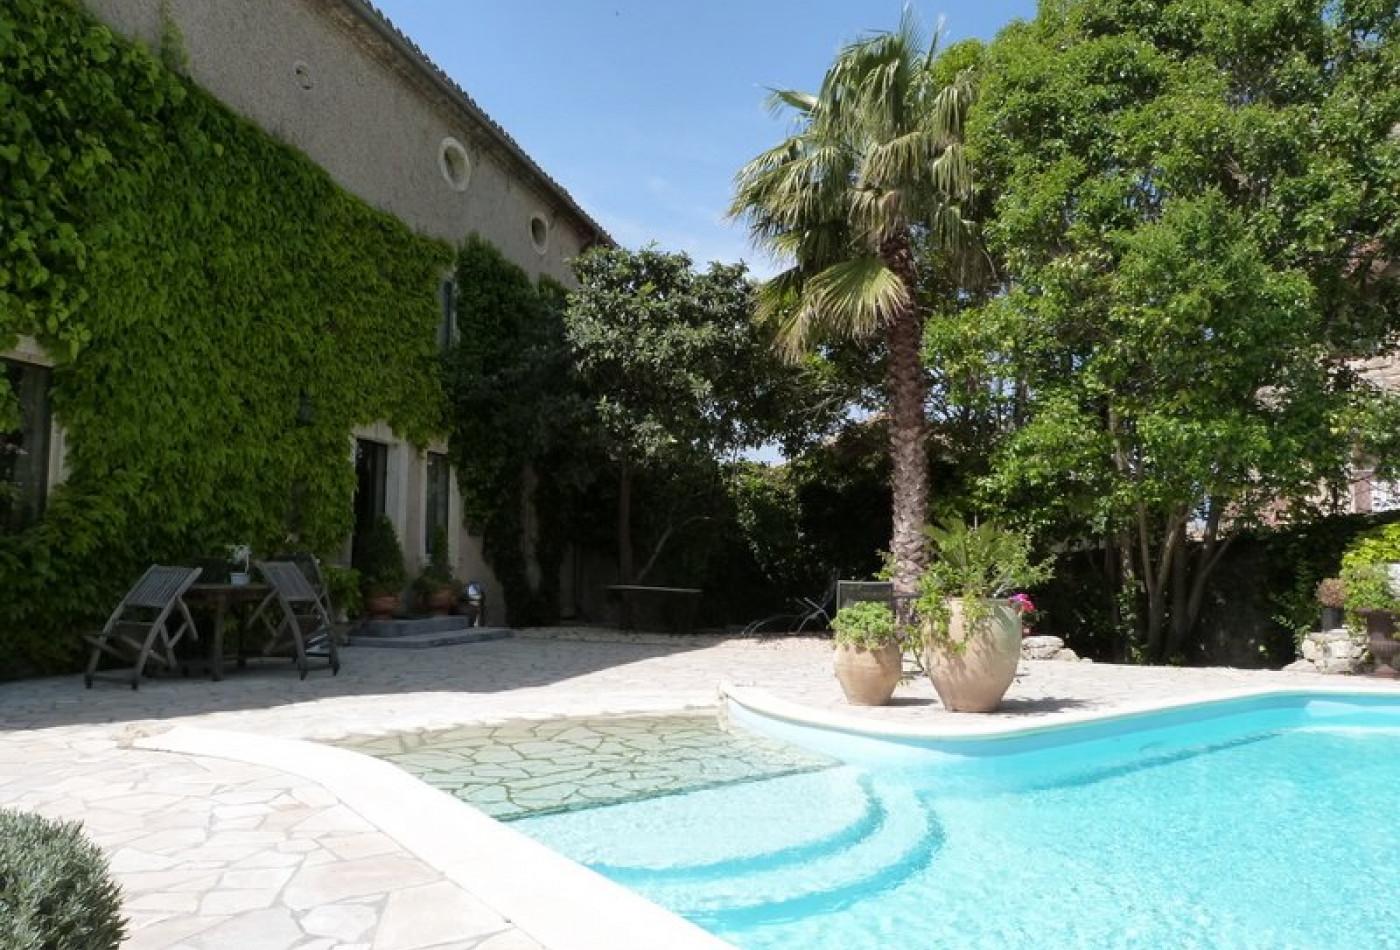 Maison en vente pezenas rf340135306 agence casanova for Piscine pezenas